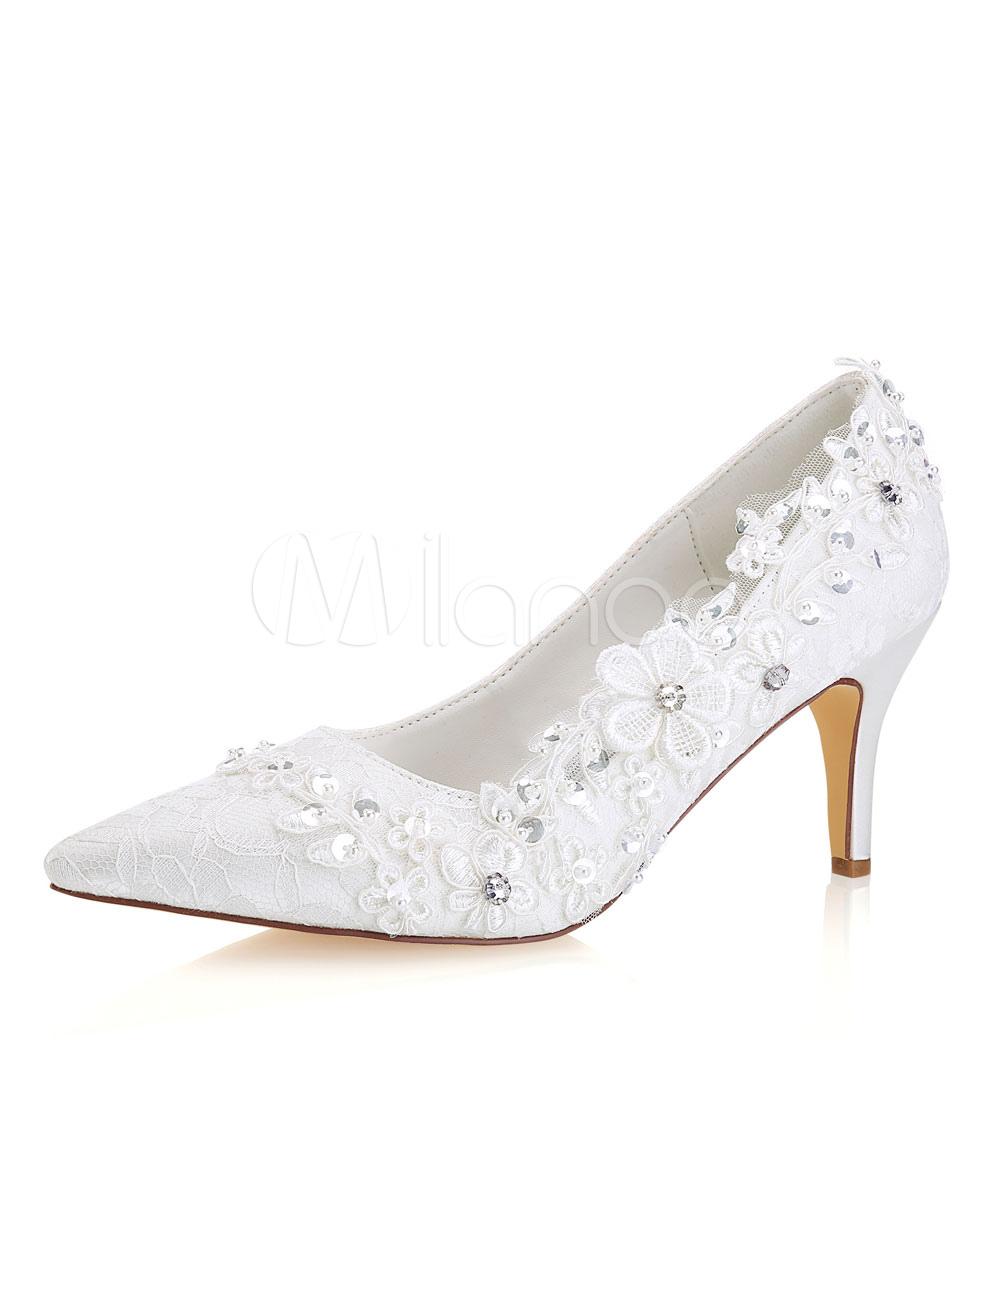 3e6e4181409 Ivory Wedding Shoes Lace Pointed Toe Rhinestones High Heel Bridal ...